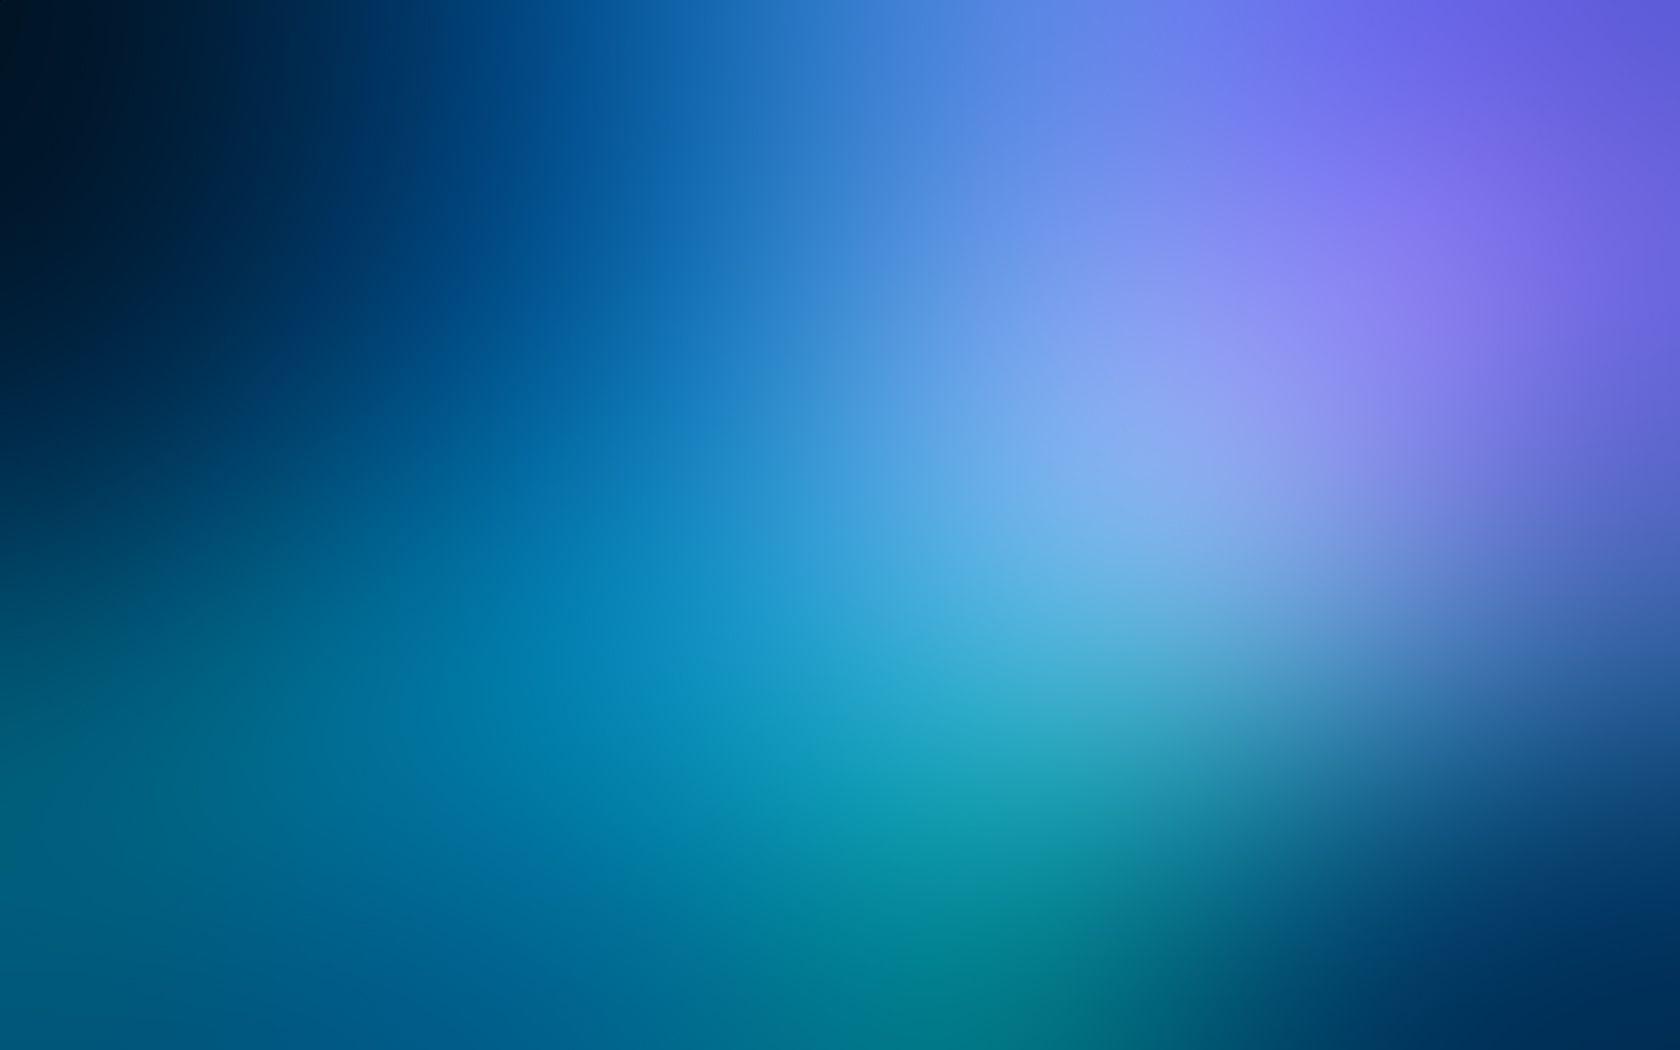 Pin On Blur